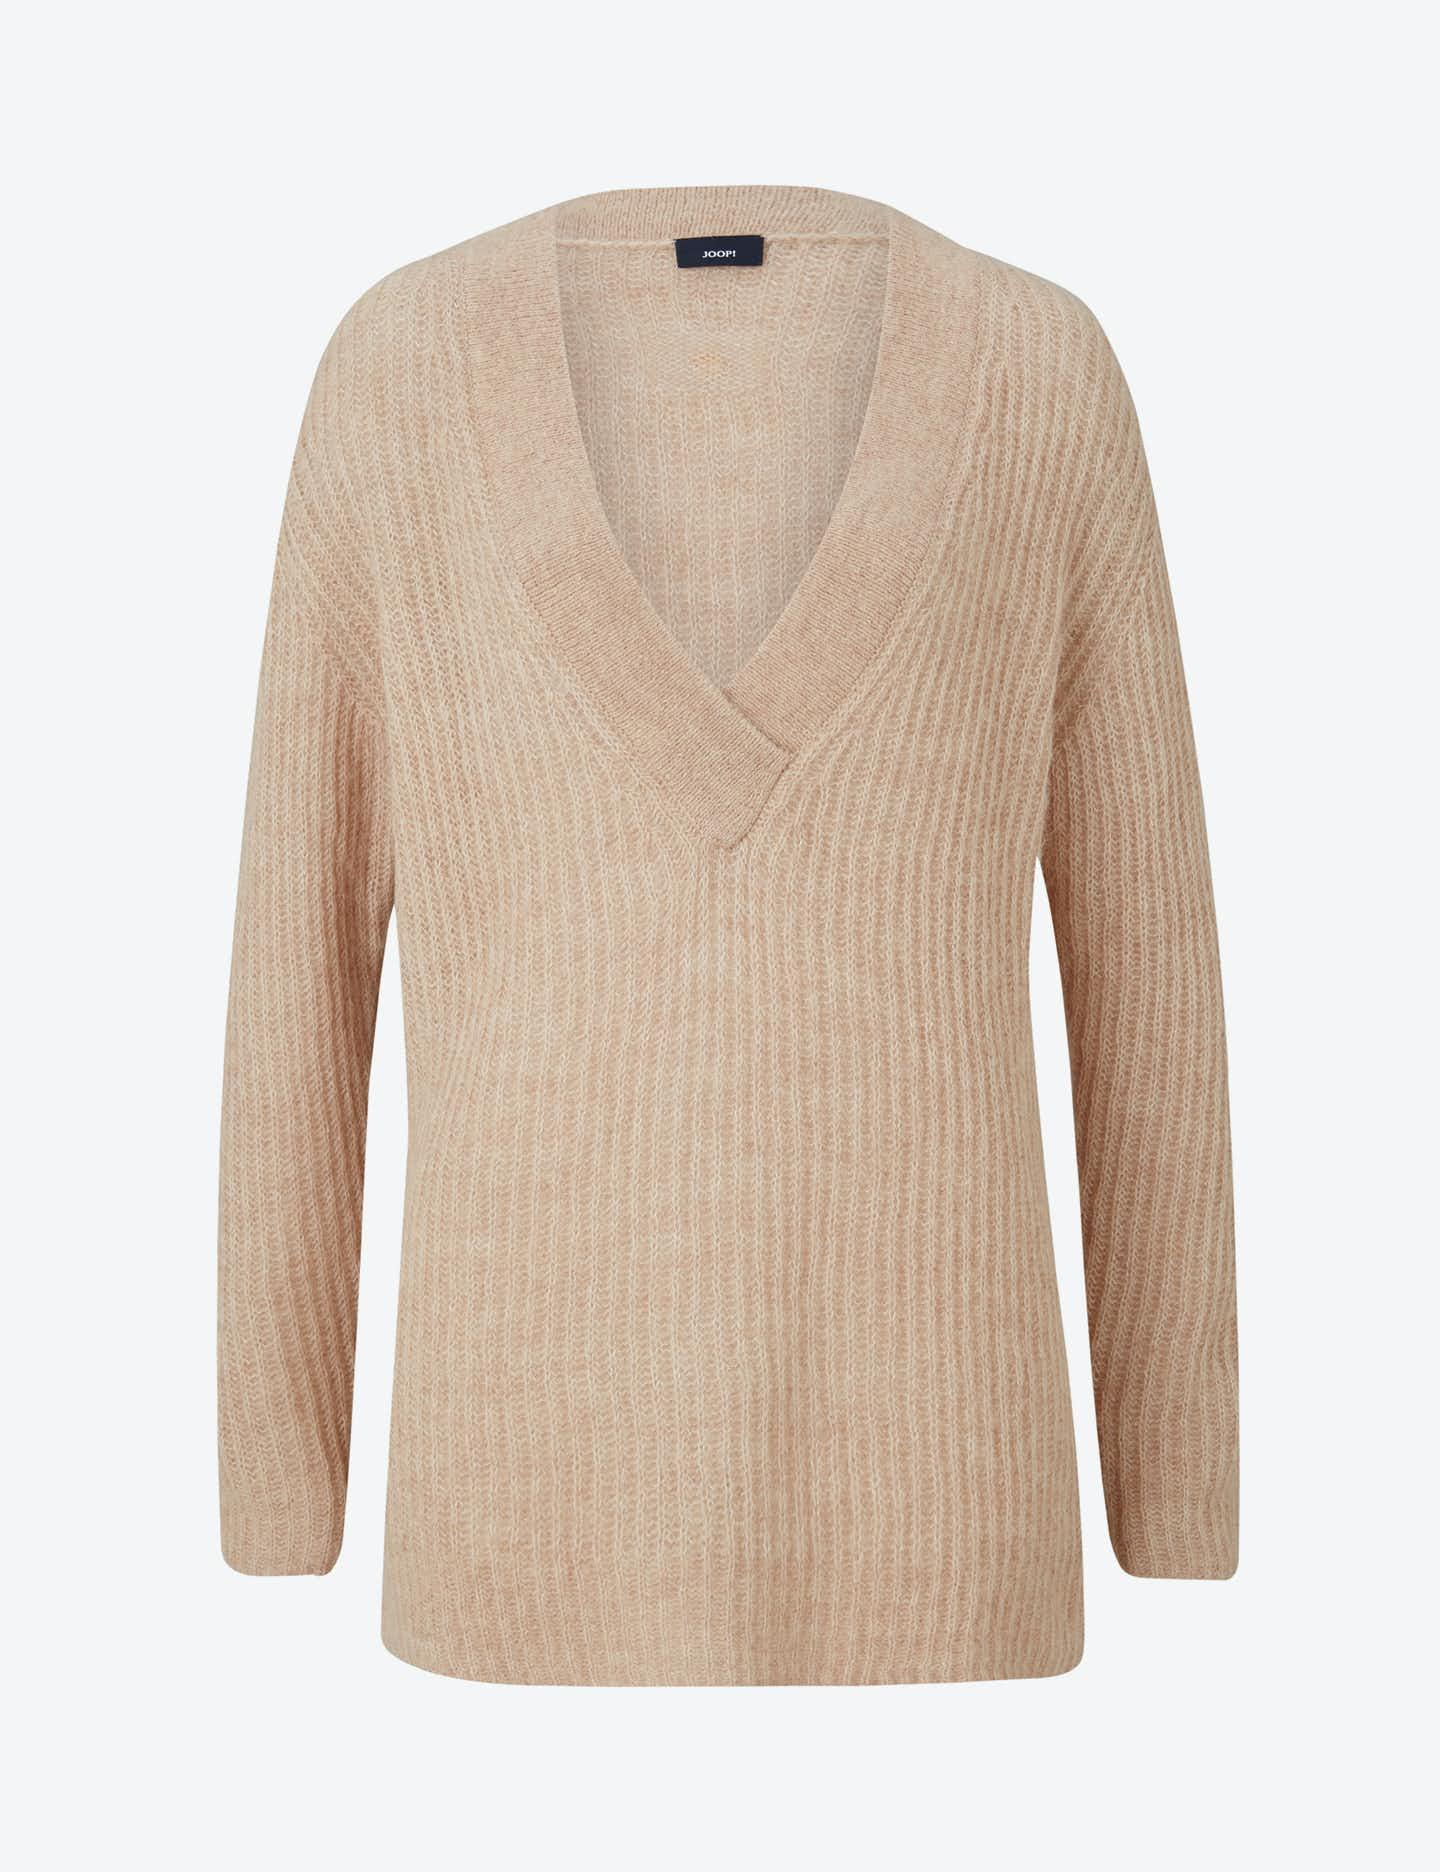 Pullover Keralis in Beige